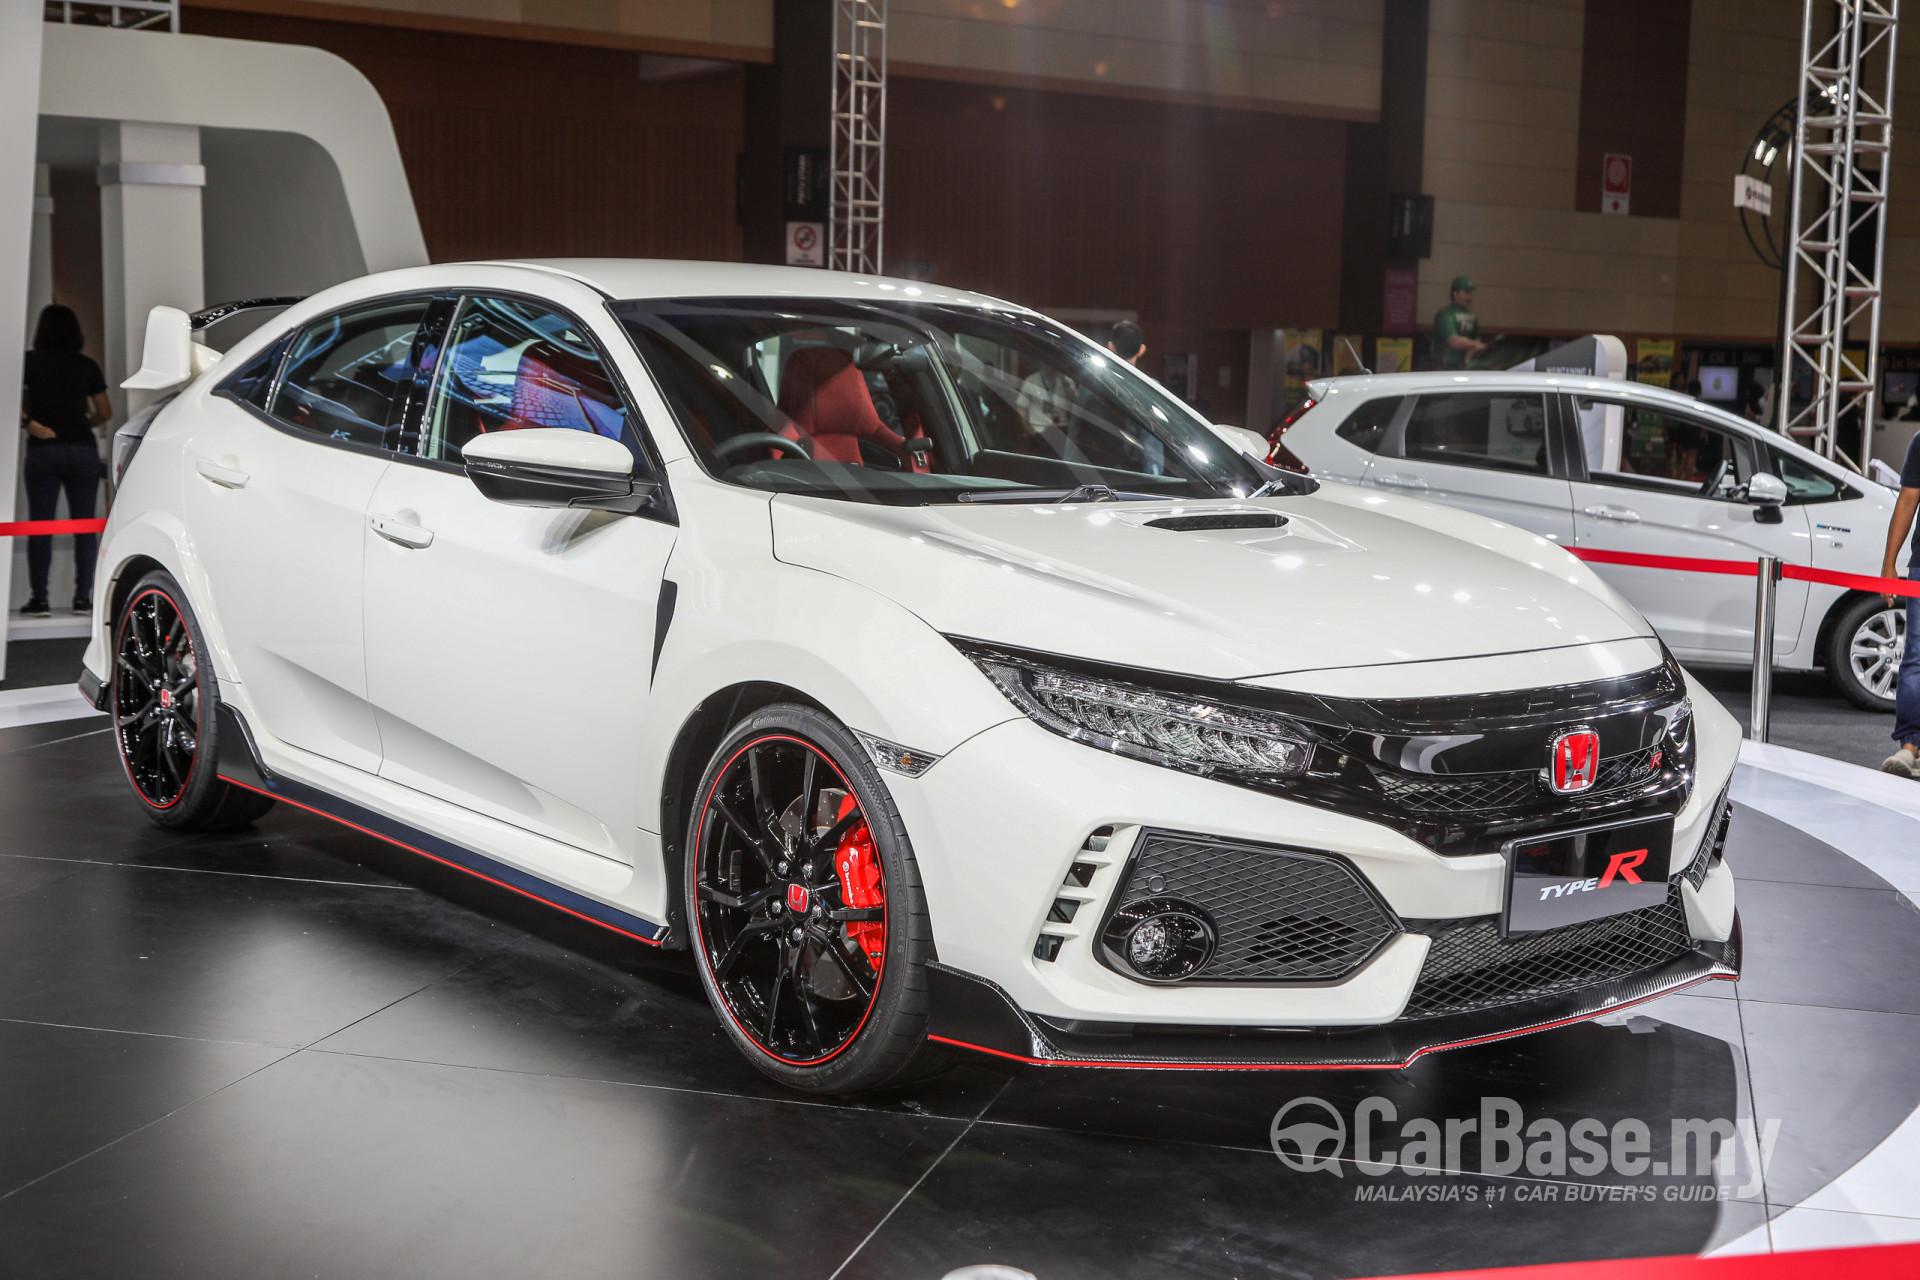 Honda Civic Type R FK8 2017 Exterior Image 42704 In